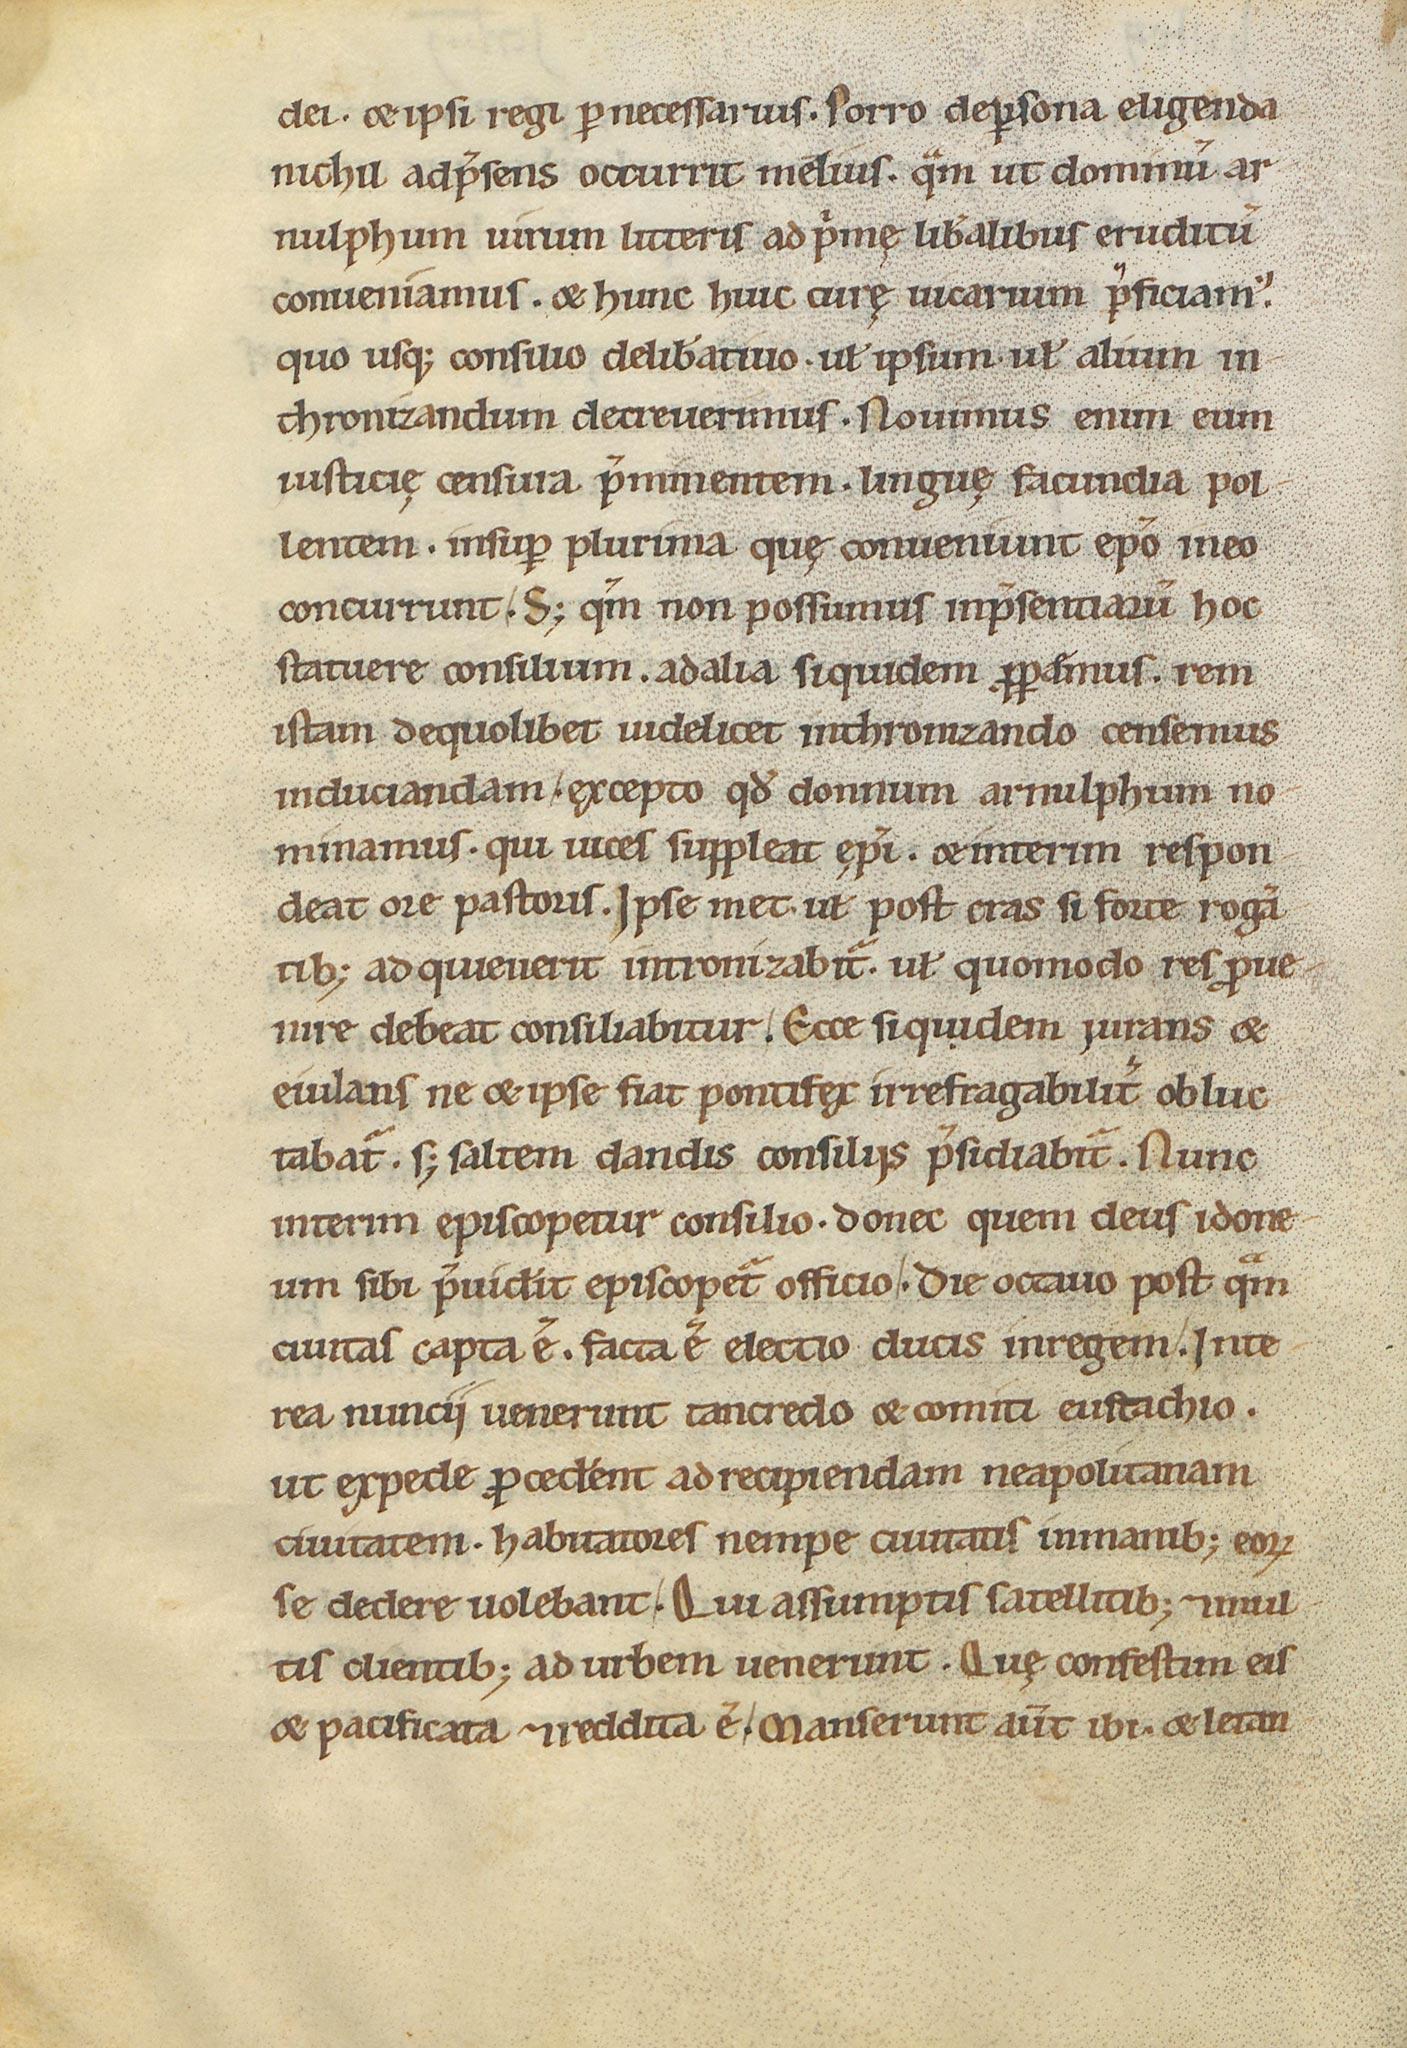 Manuscrit-Historia-Hierosolimitana-97v°